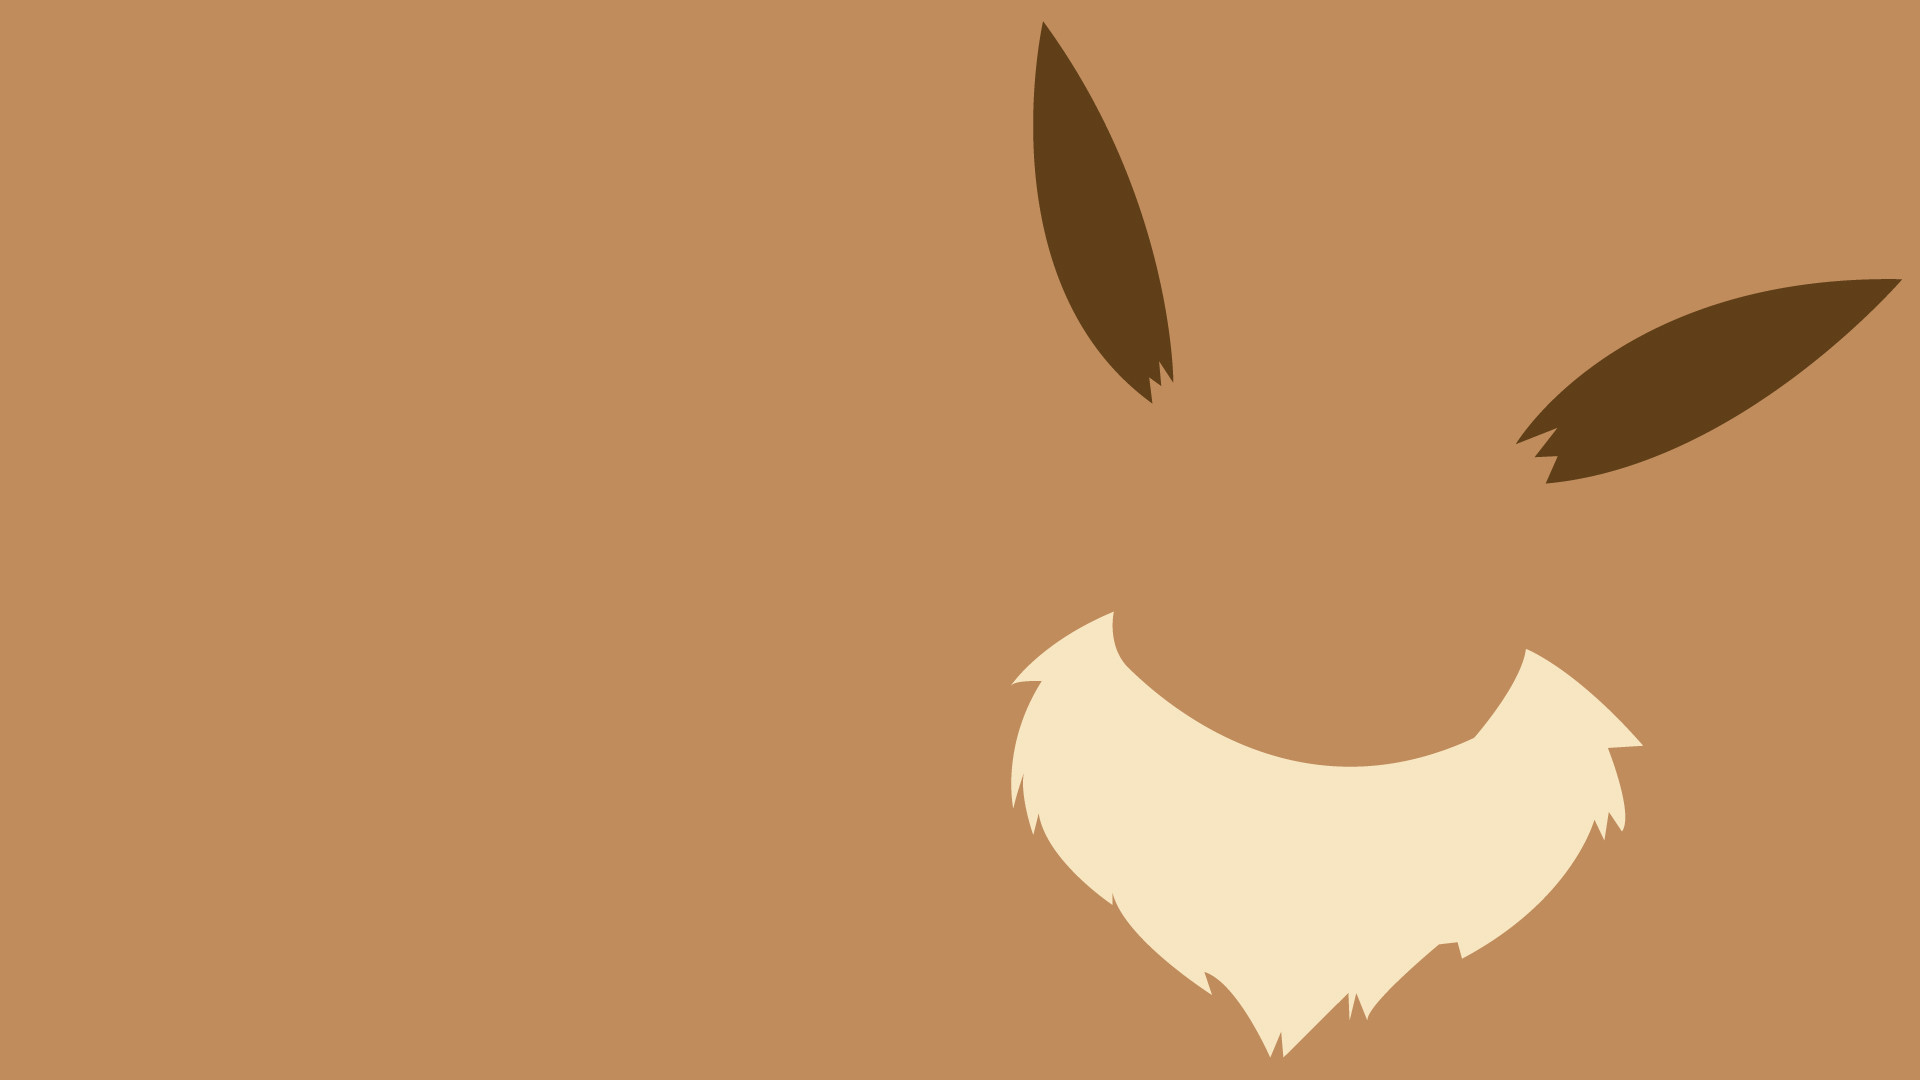 the Eevee one :) https://i.imgur.com/W2yVH7N.jpg